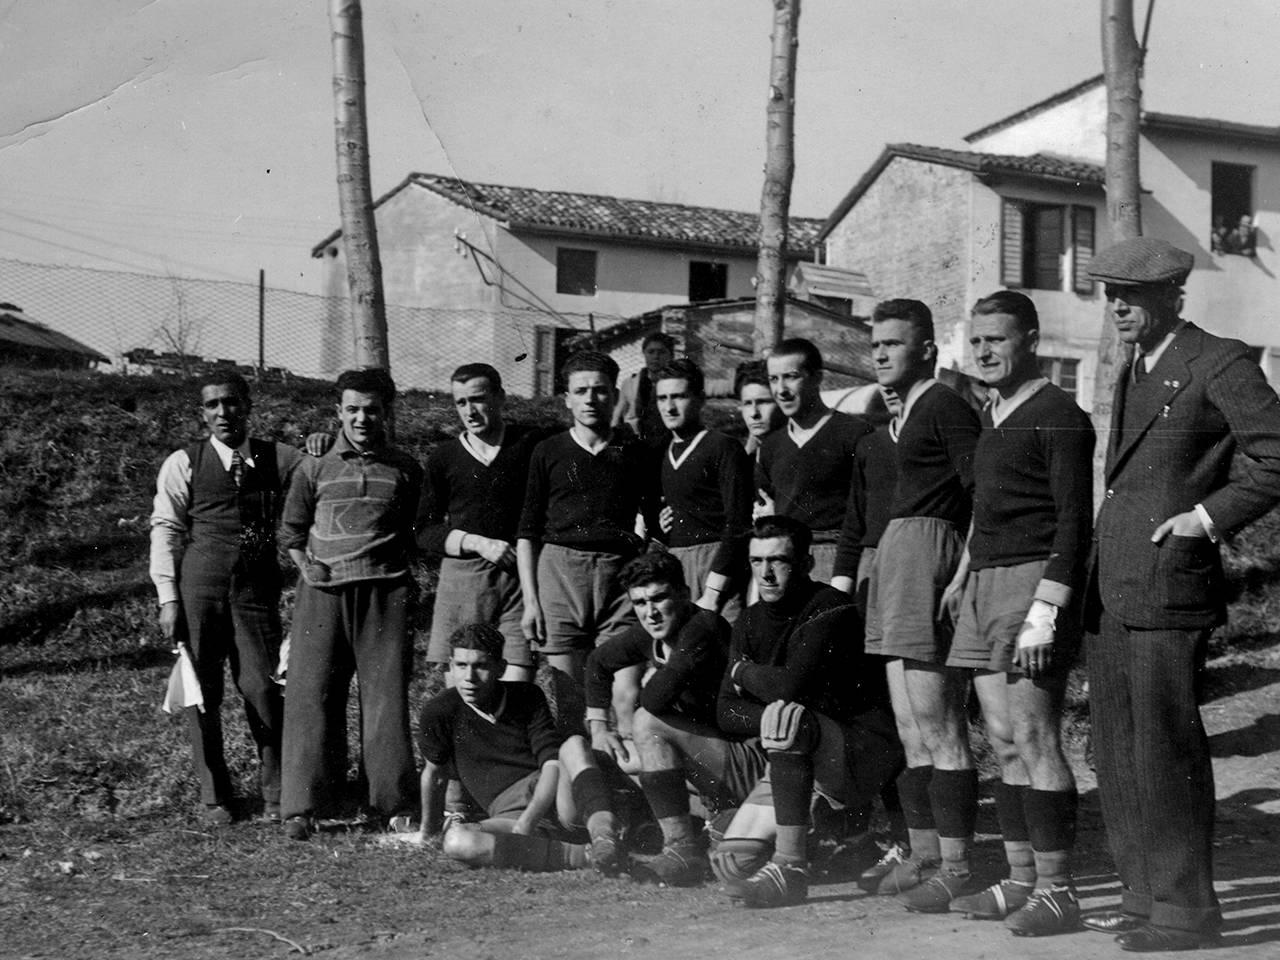 La squadra della Reggiana a Carpi Fototeca Biblioteca Panizzi, Carpi 1933